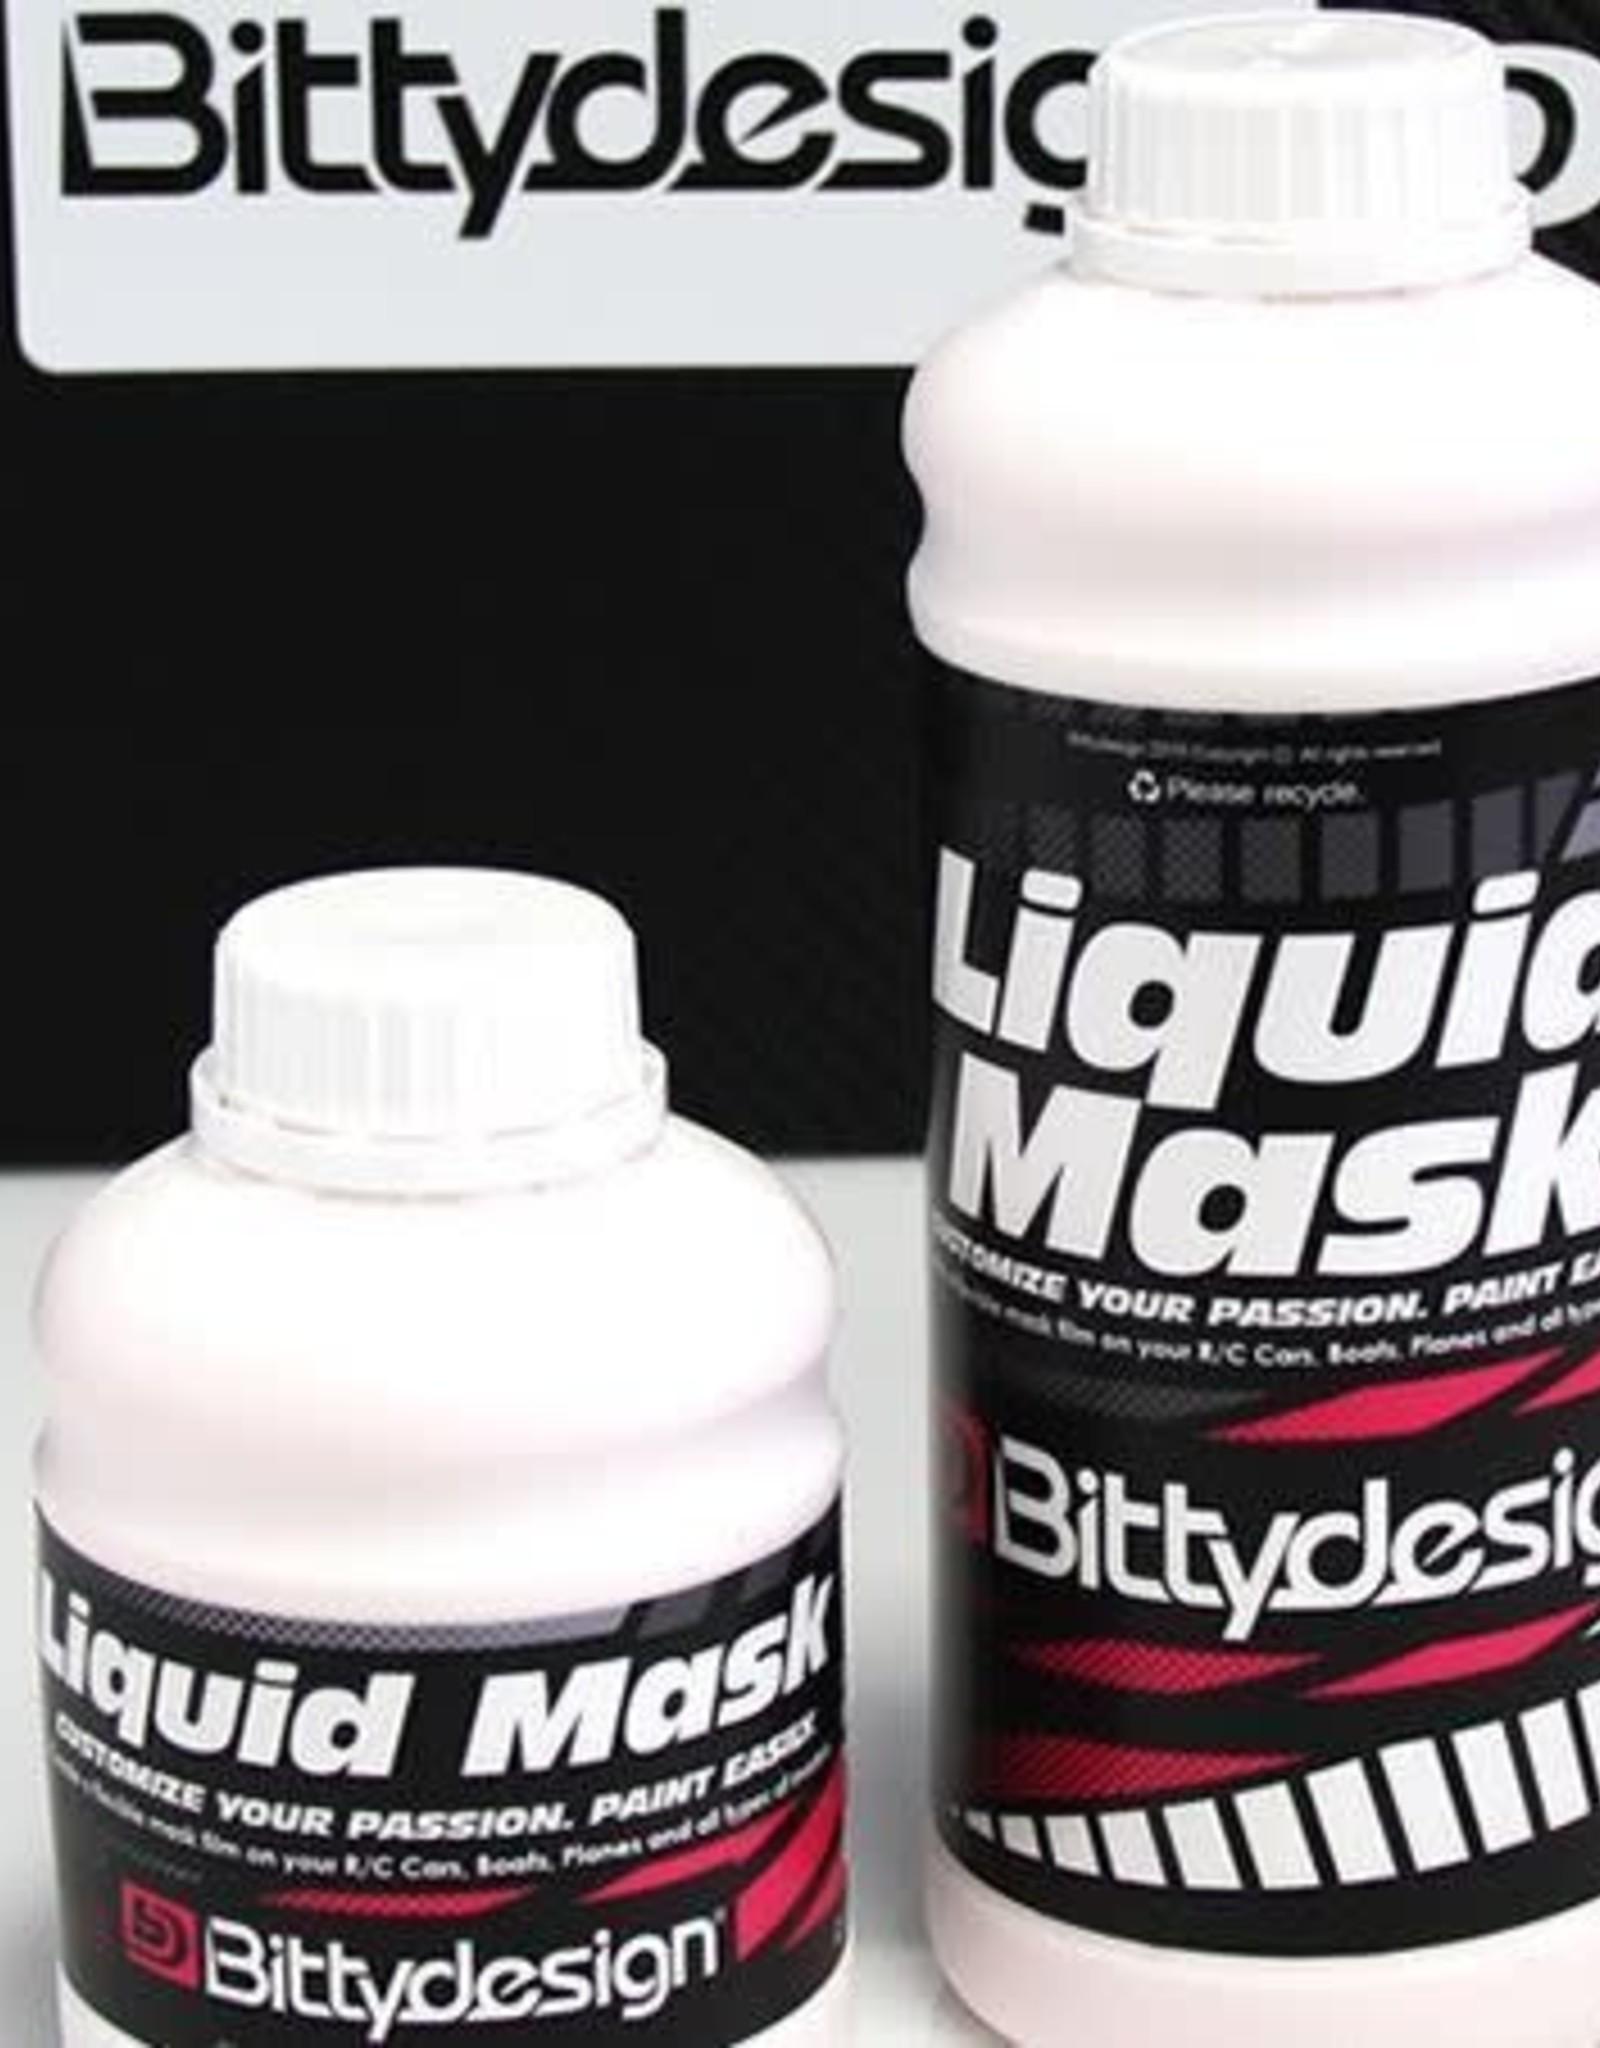 Bittydesign Bittydesign liquid mask 32oz